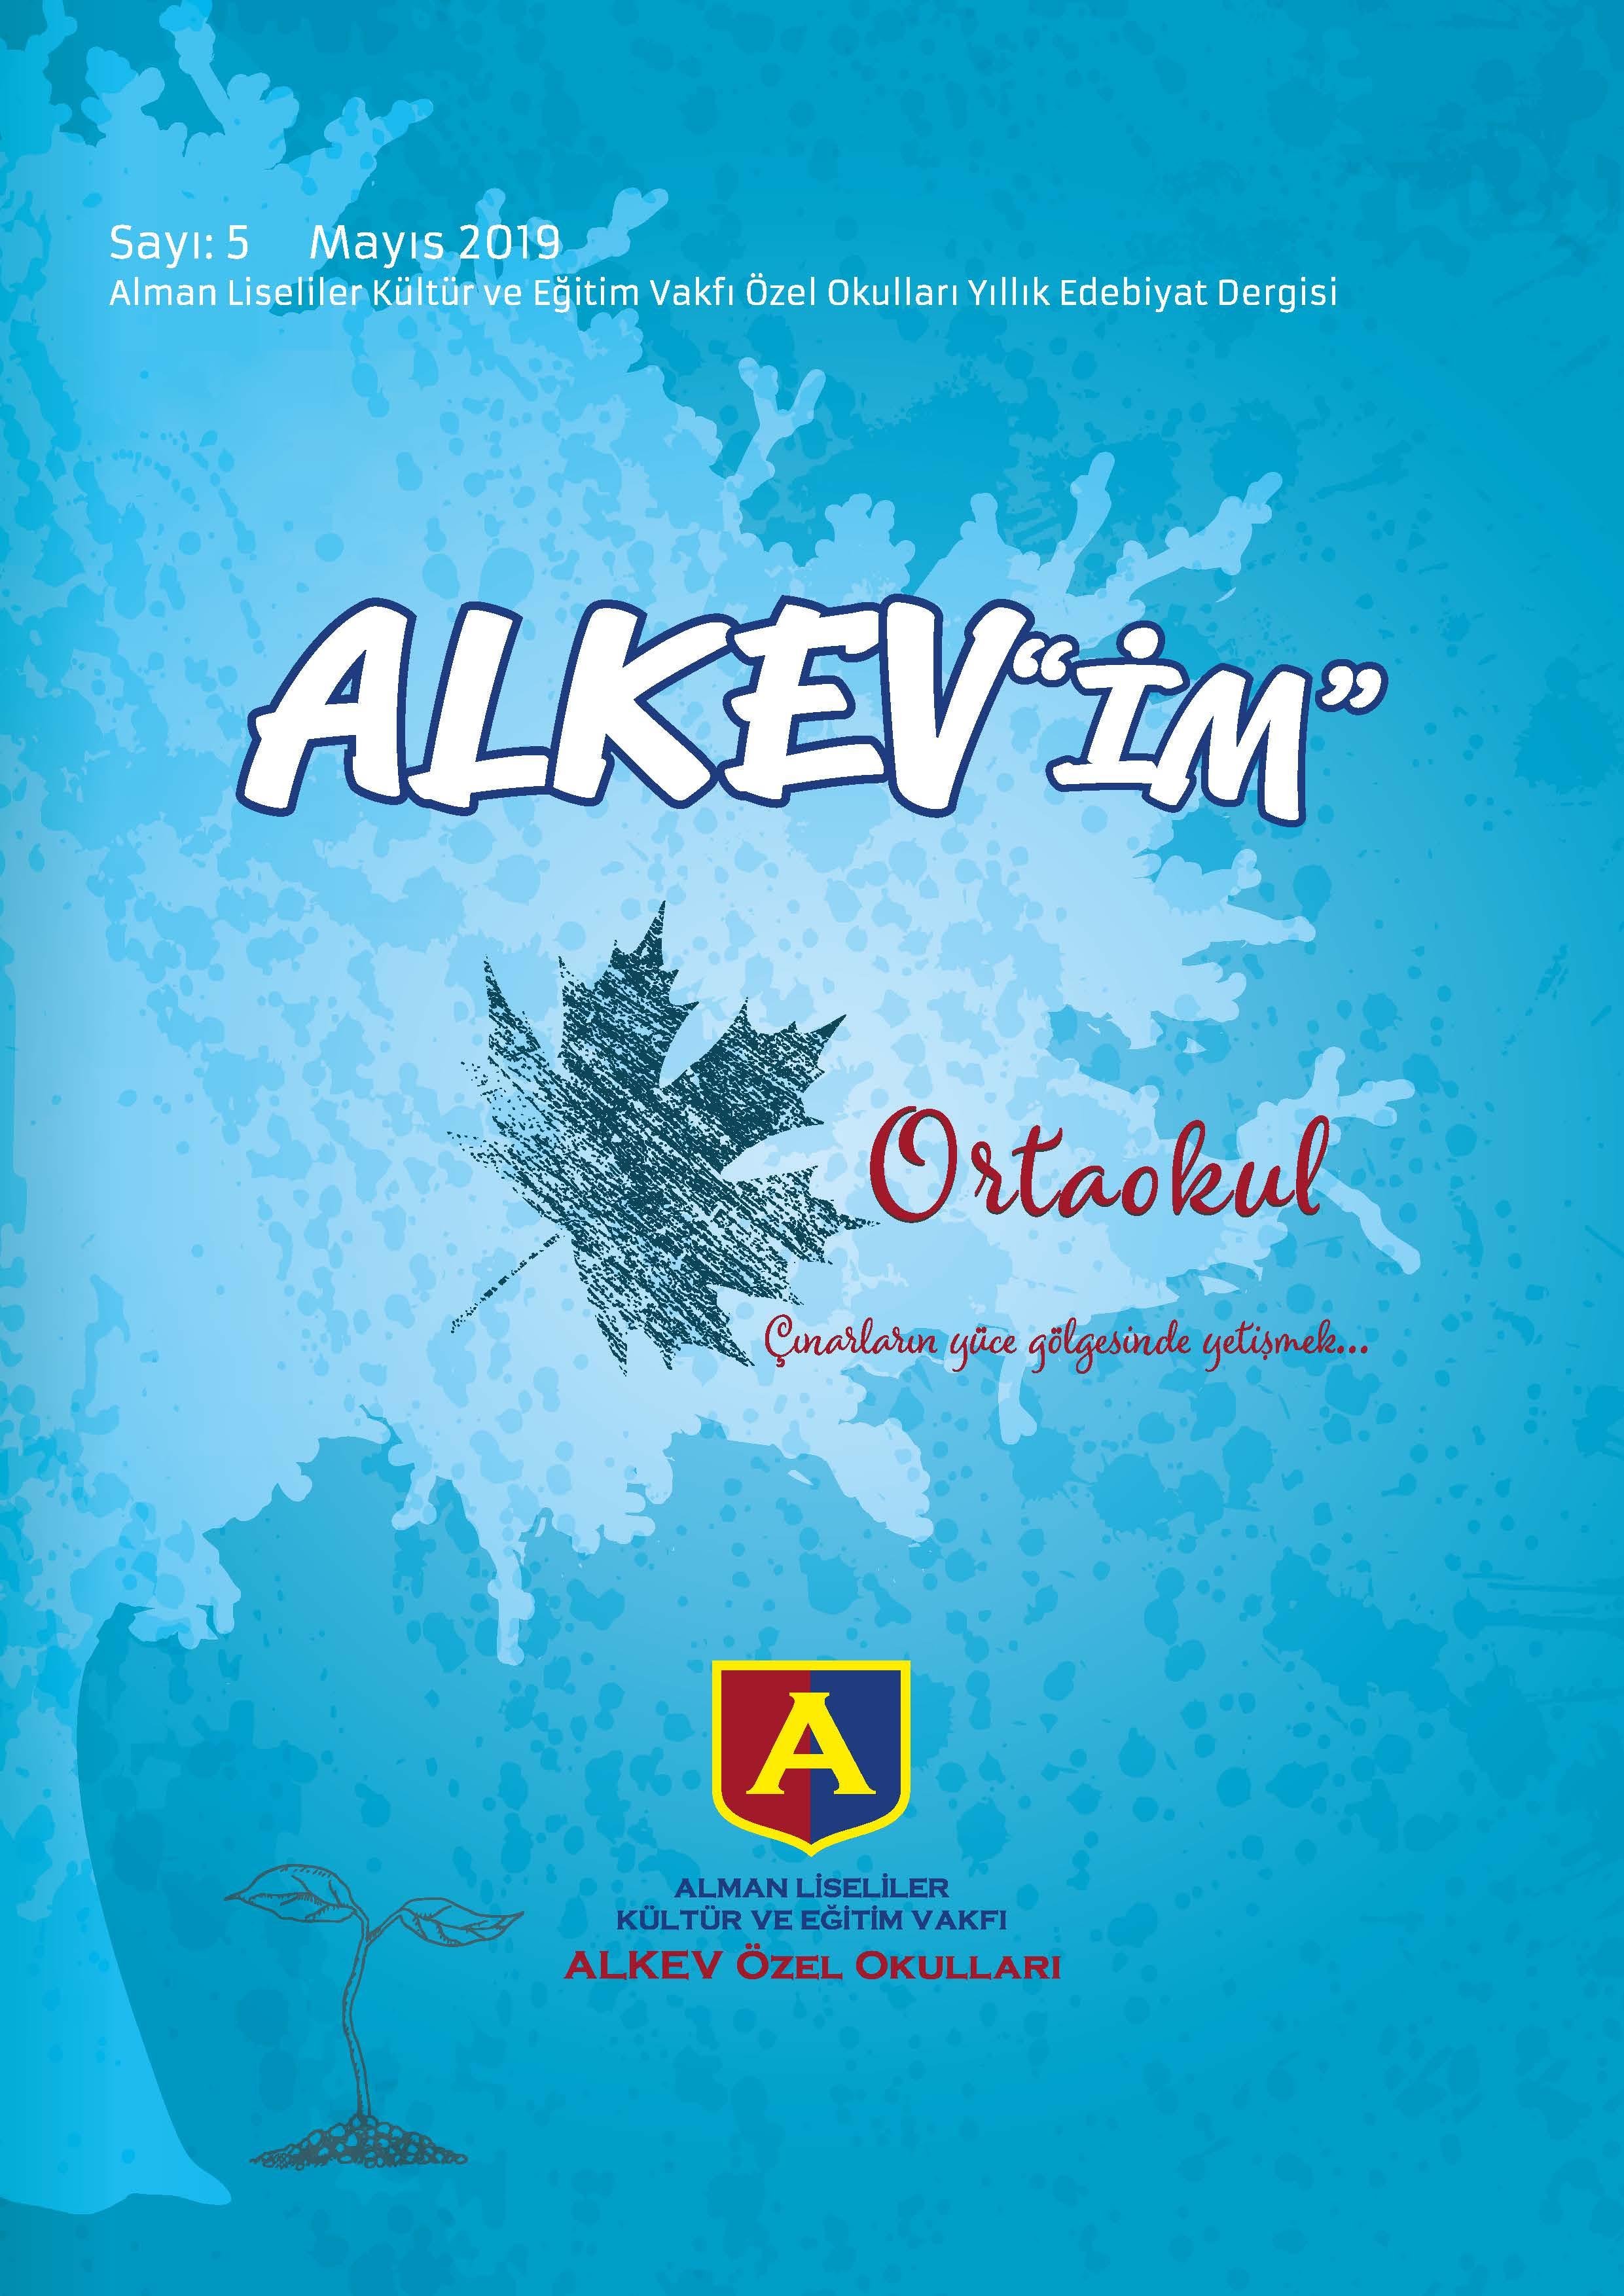 ALKEV'İM' Ortaokul - Sayı: 5 / Mayıs 2019